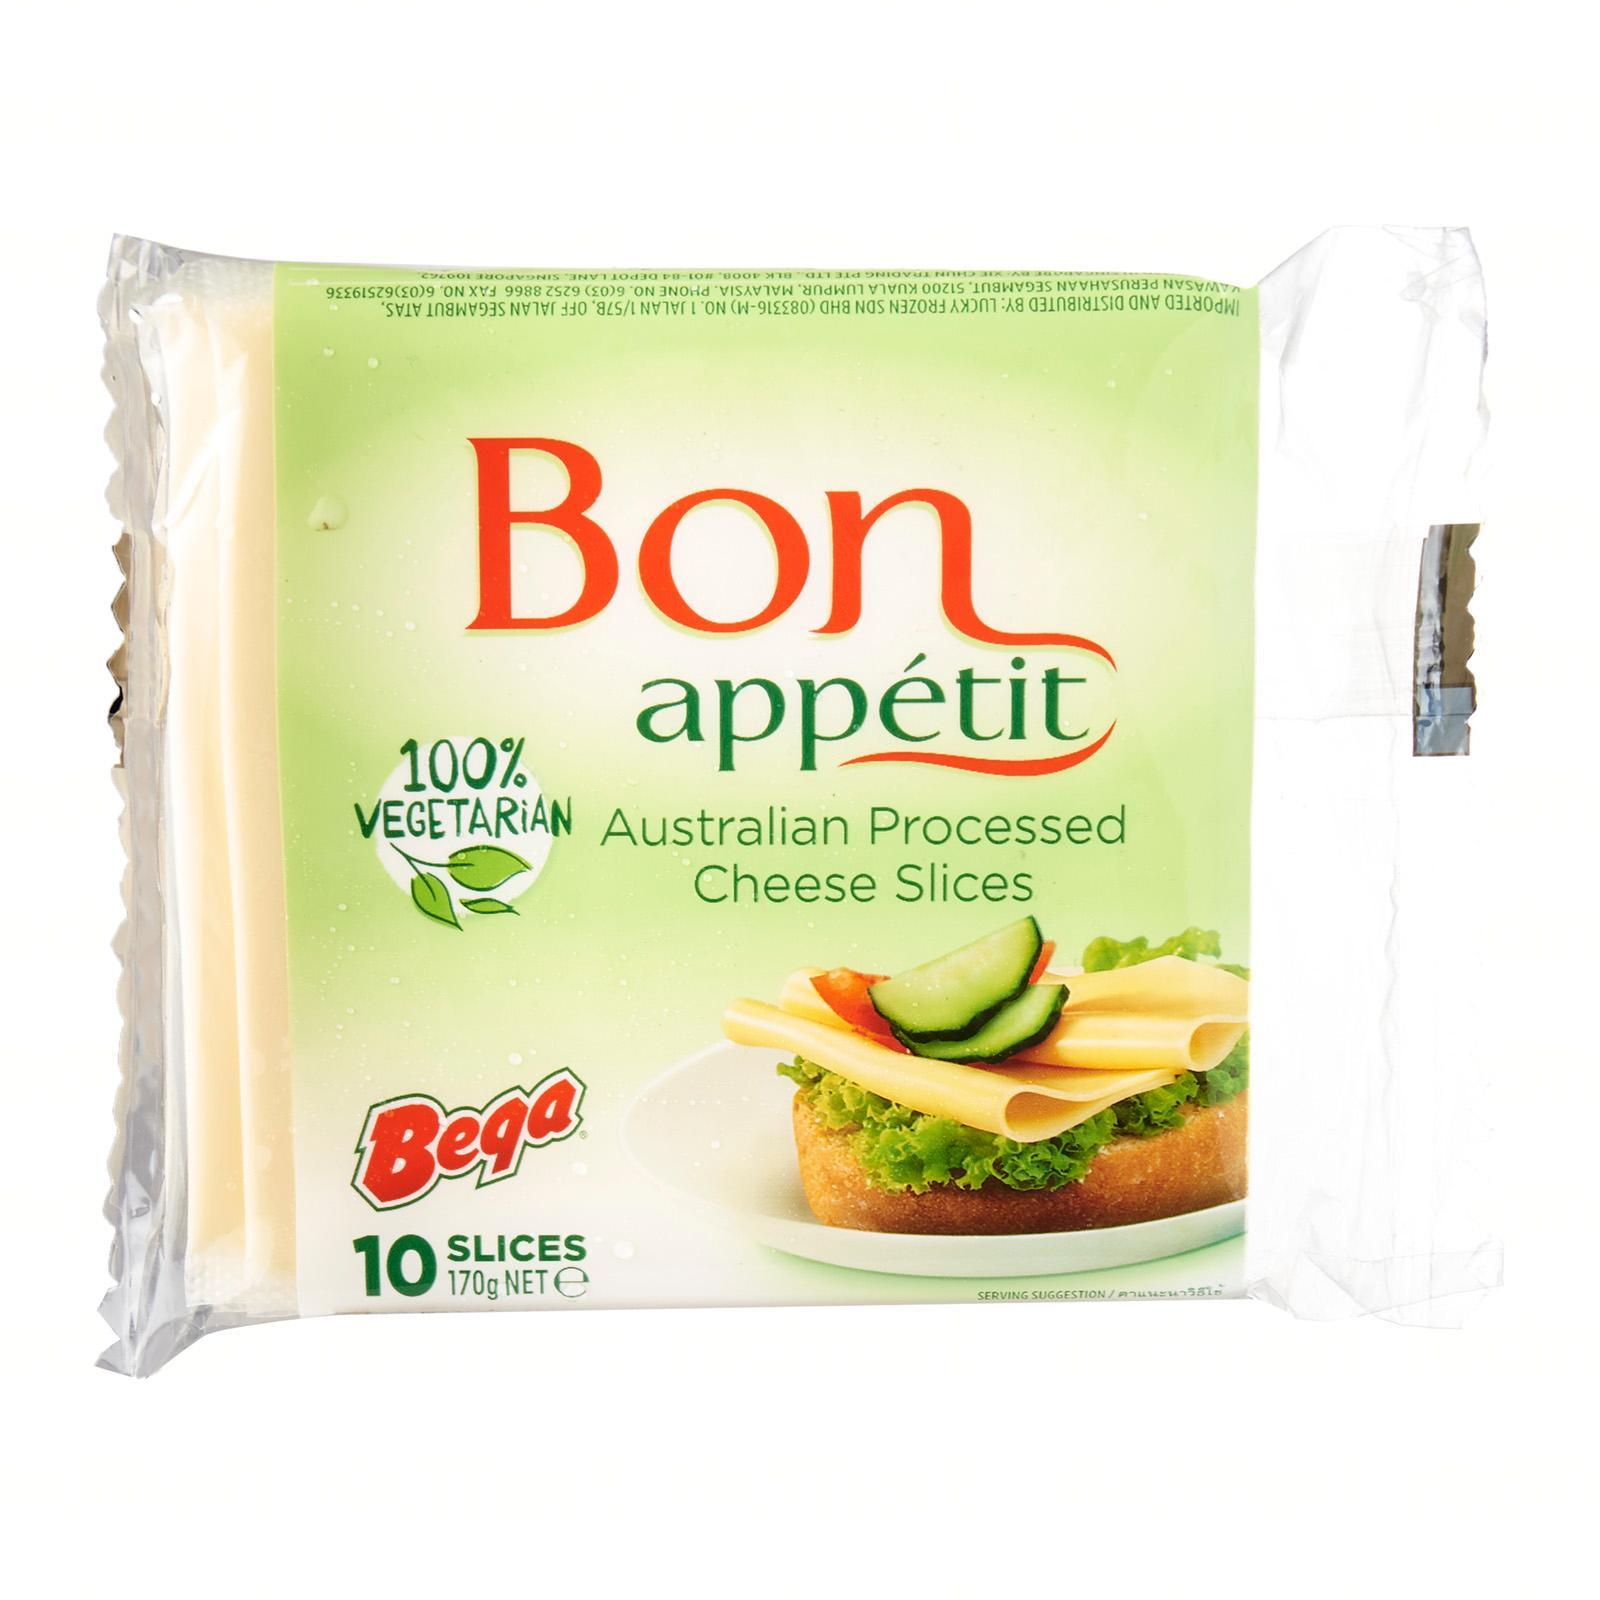 Bega Bon Appetit Vegetarian Processed Cheese Slices 10 Pcs